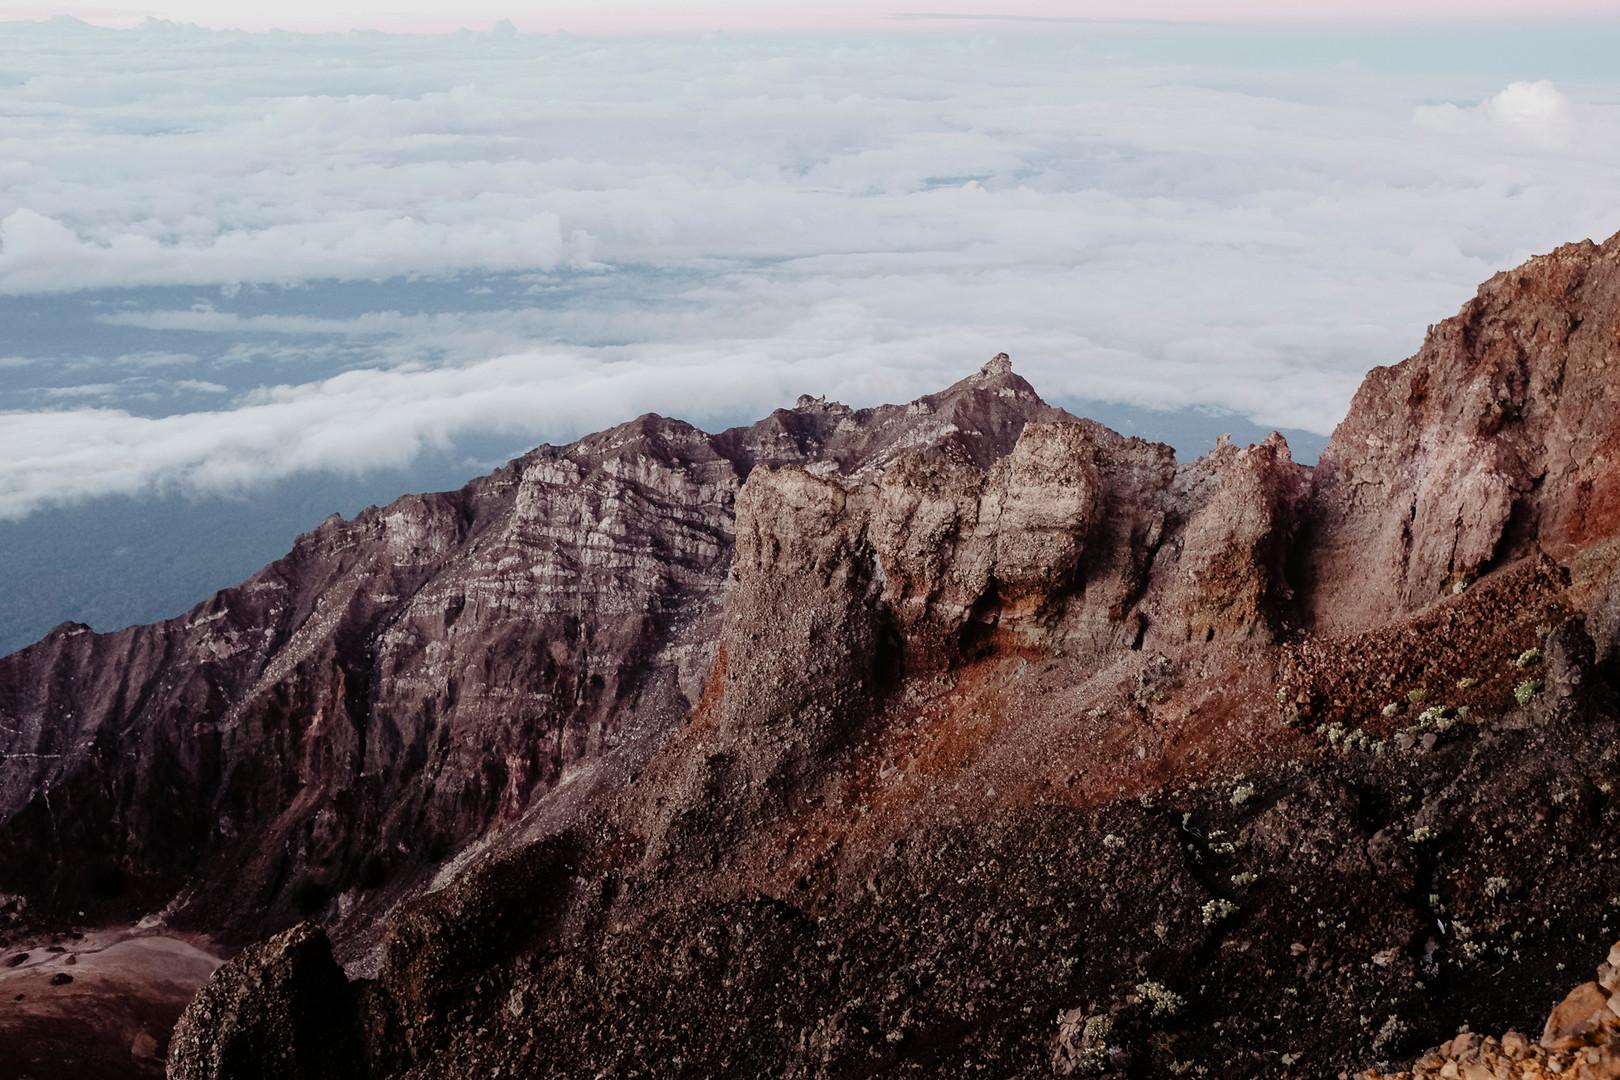 2017-07-12 Mt Rinjani (146)-FB.jpg